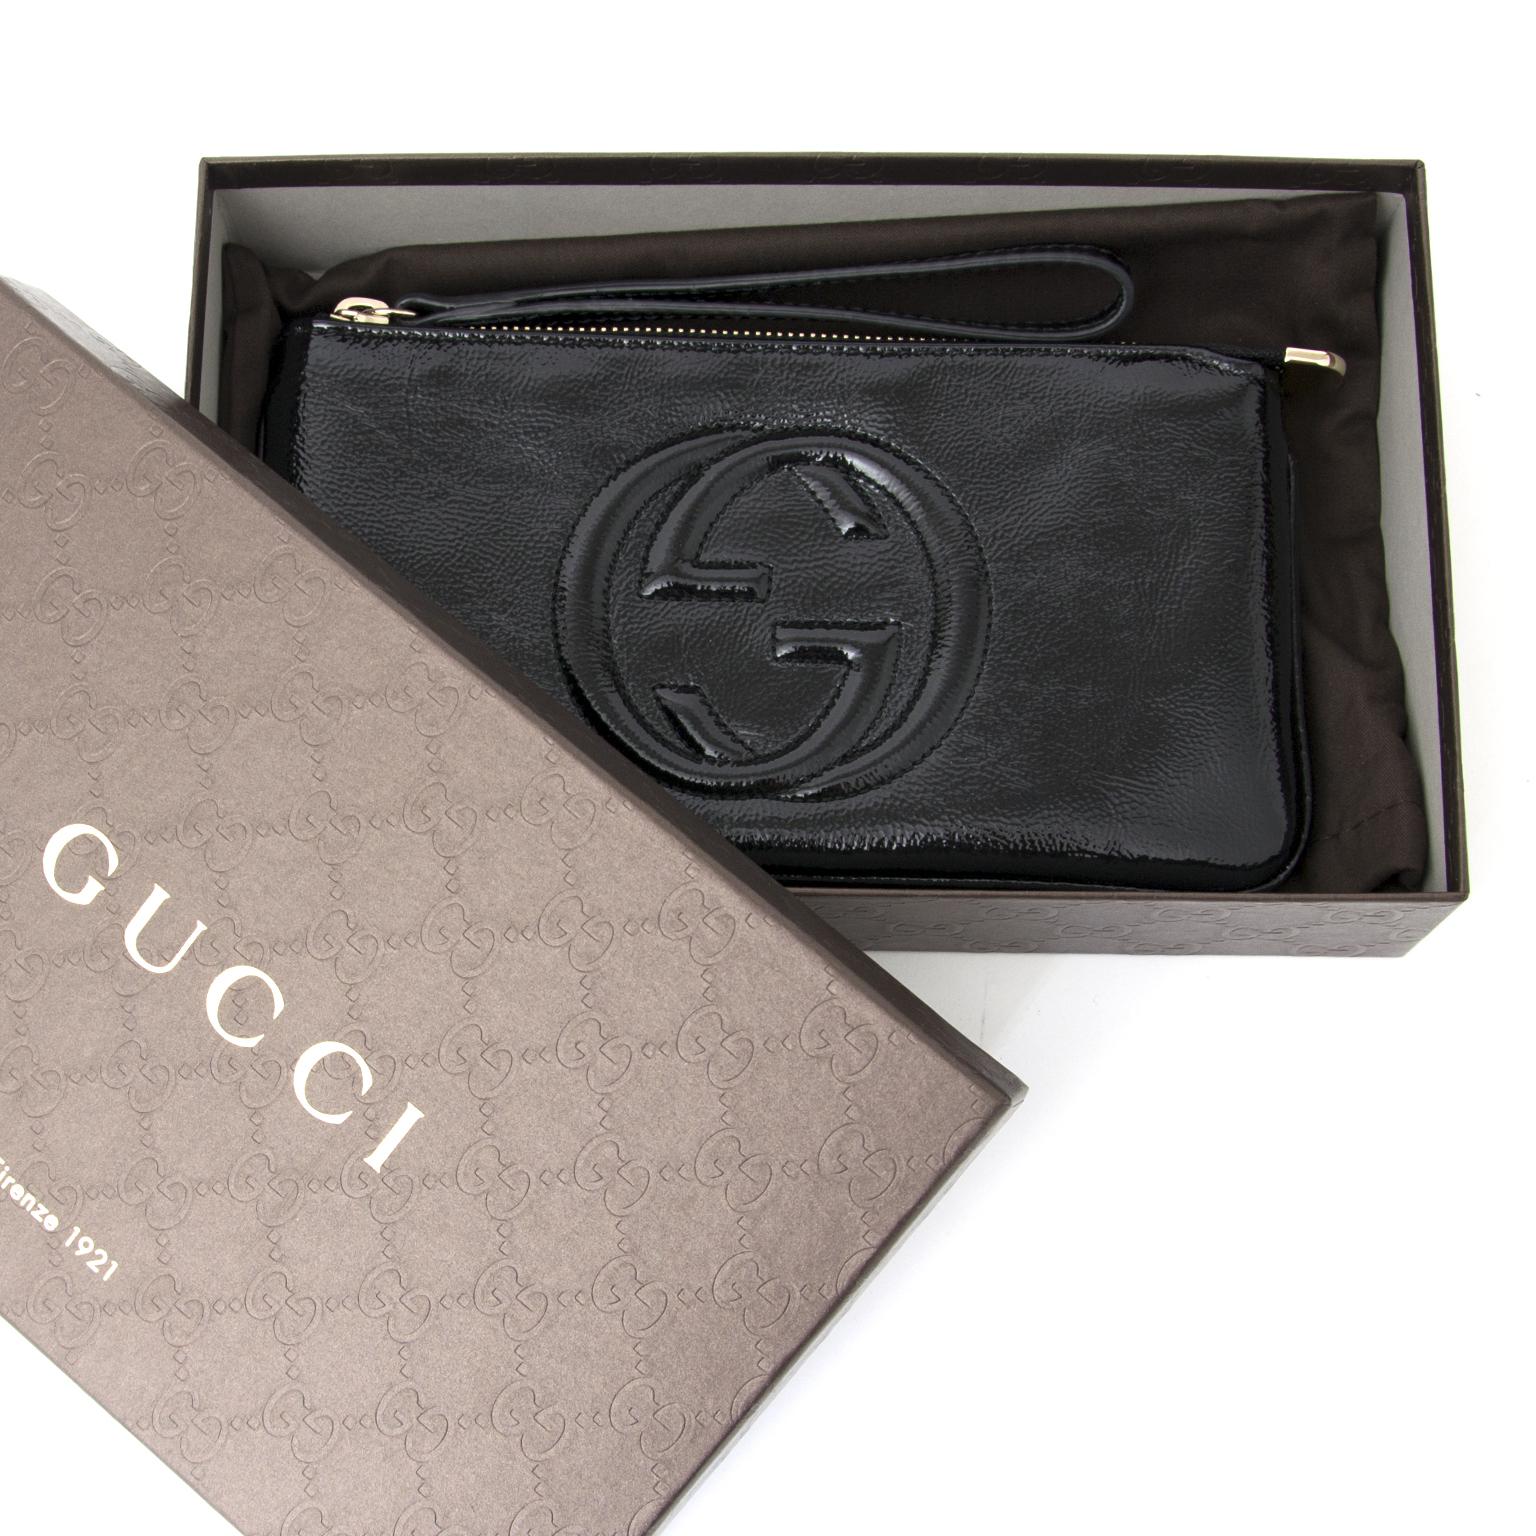 shop safe online at the best price secondehand designer Gucci Black Soho Patent Leather Wristlet/Clutch